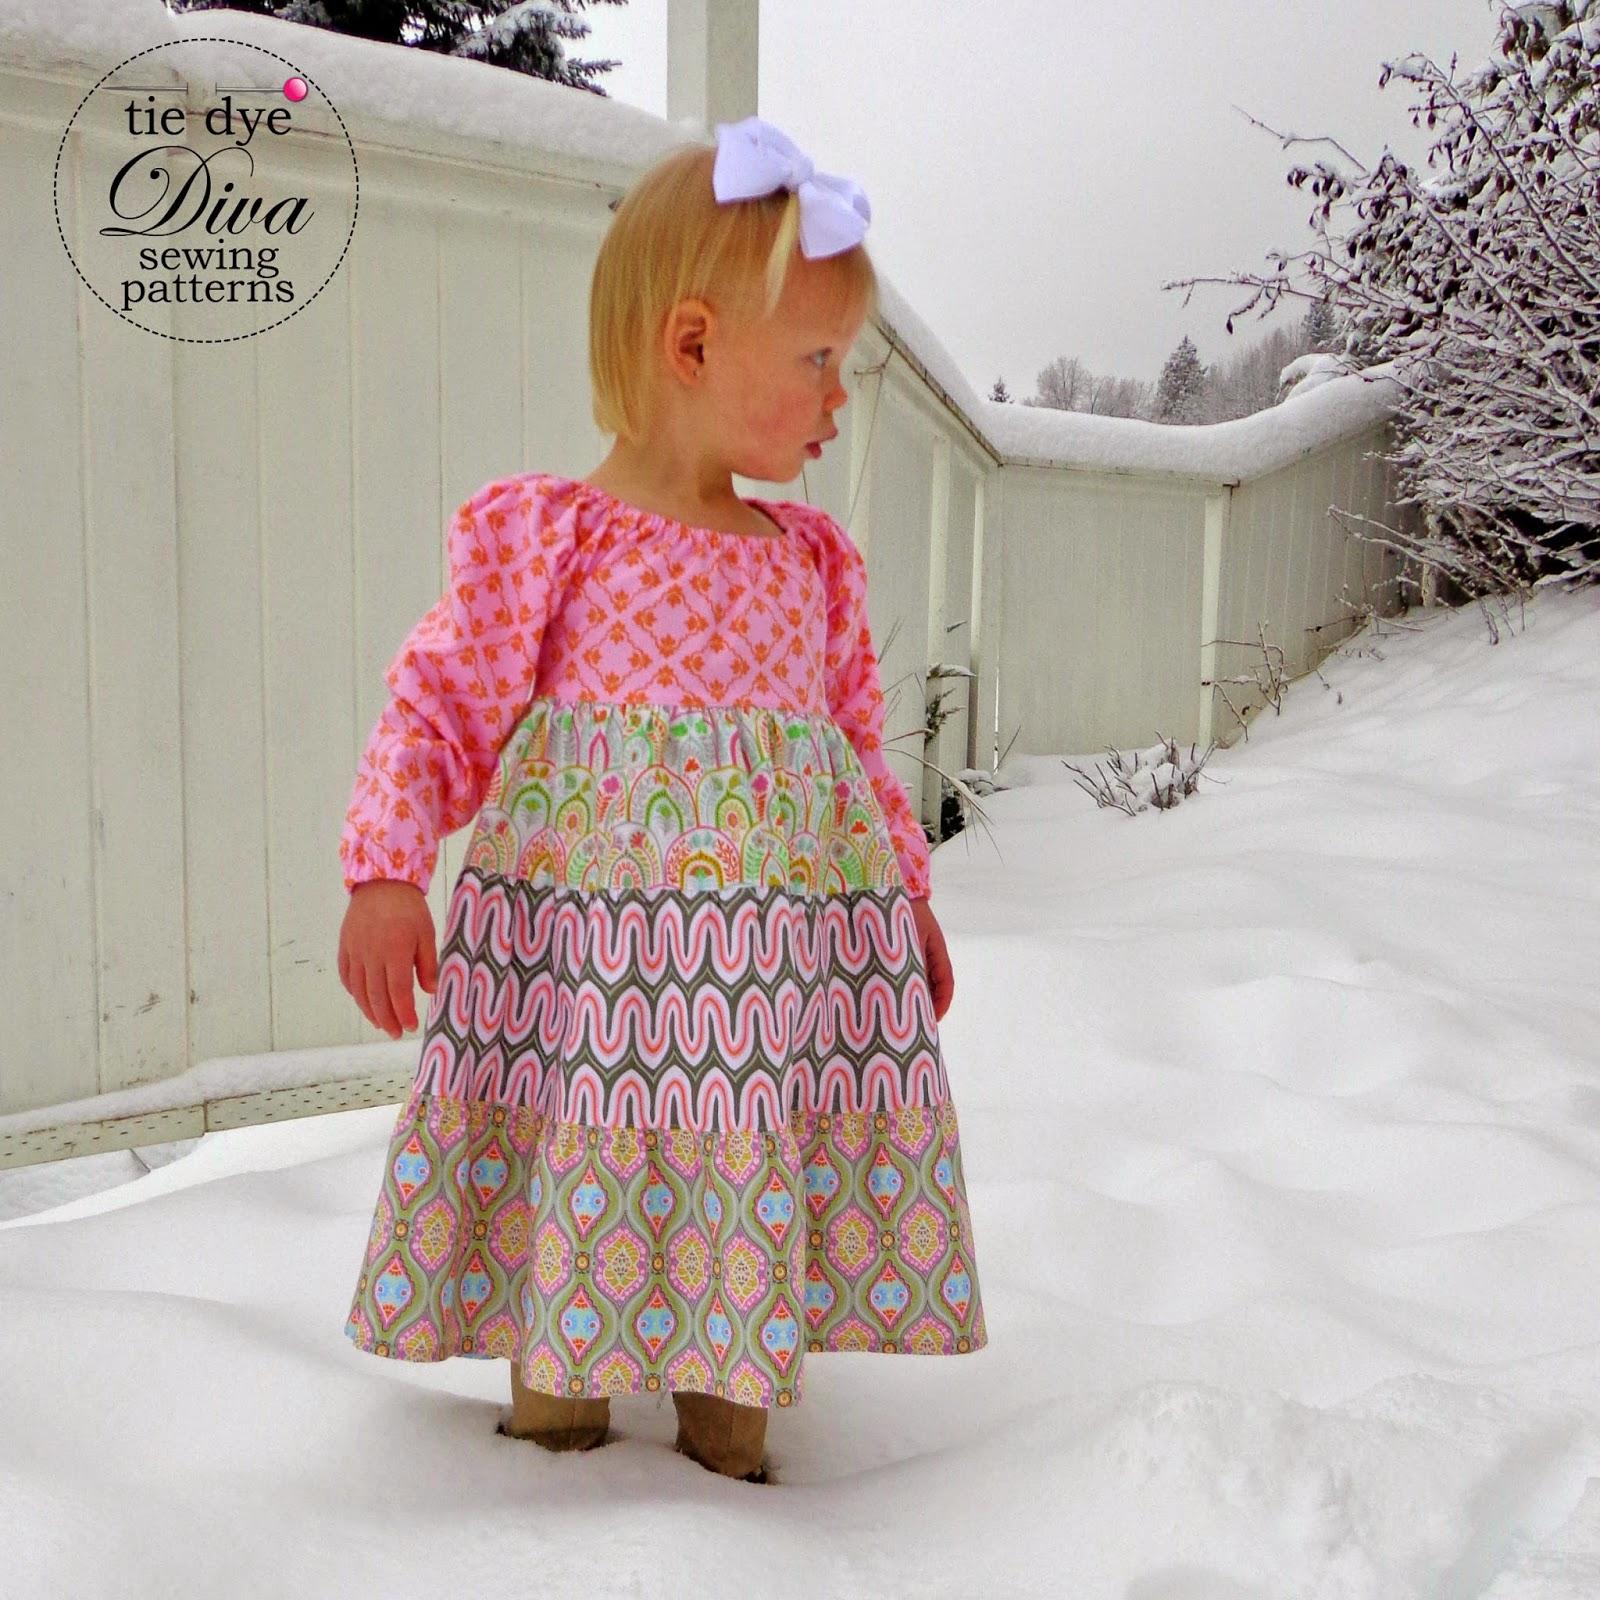 A Year of Dresses Belle Dress for Winter Tie Dye Diva Patterns Blog